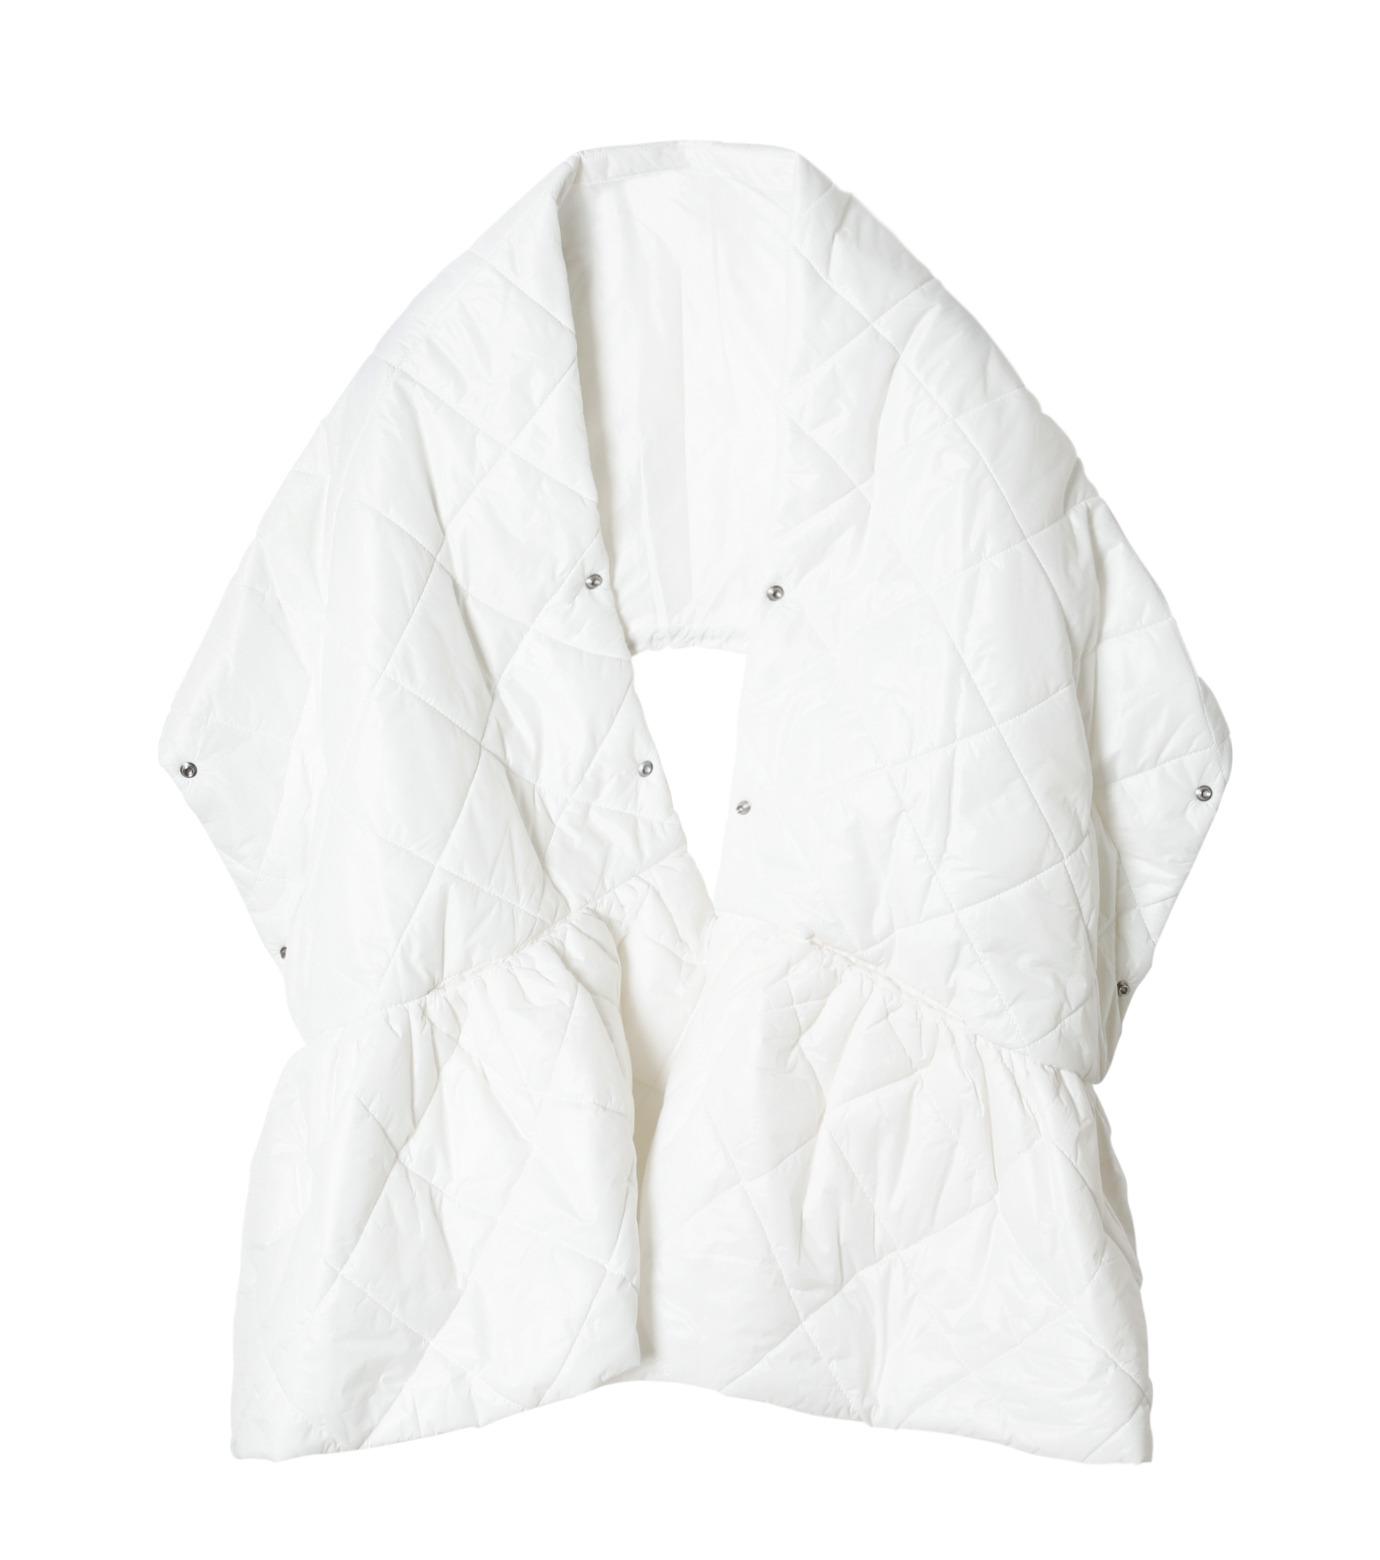 LE CIEL BLEU(ルシェルブルー)のキルティングマフラー-WHITE(アクセサリー/accessory)-18A60604 拡大詳細画像5